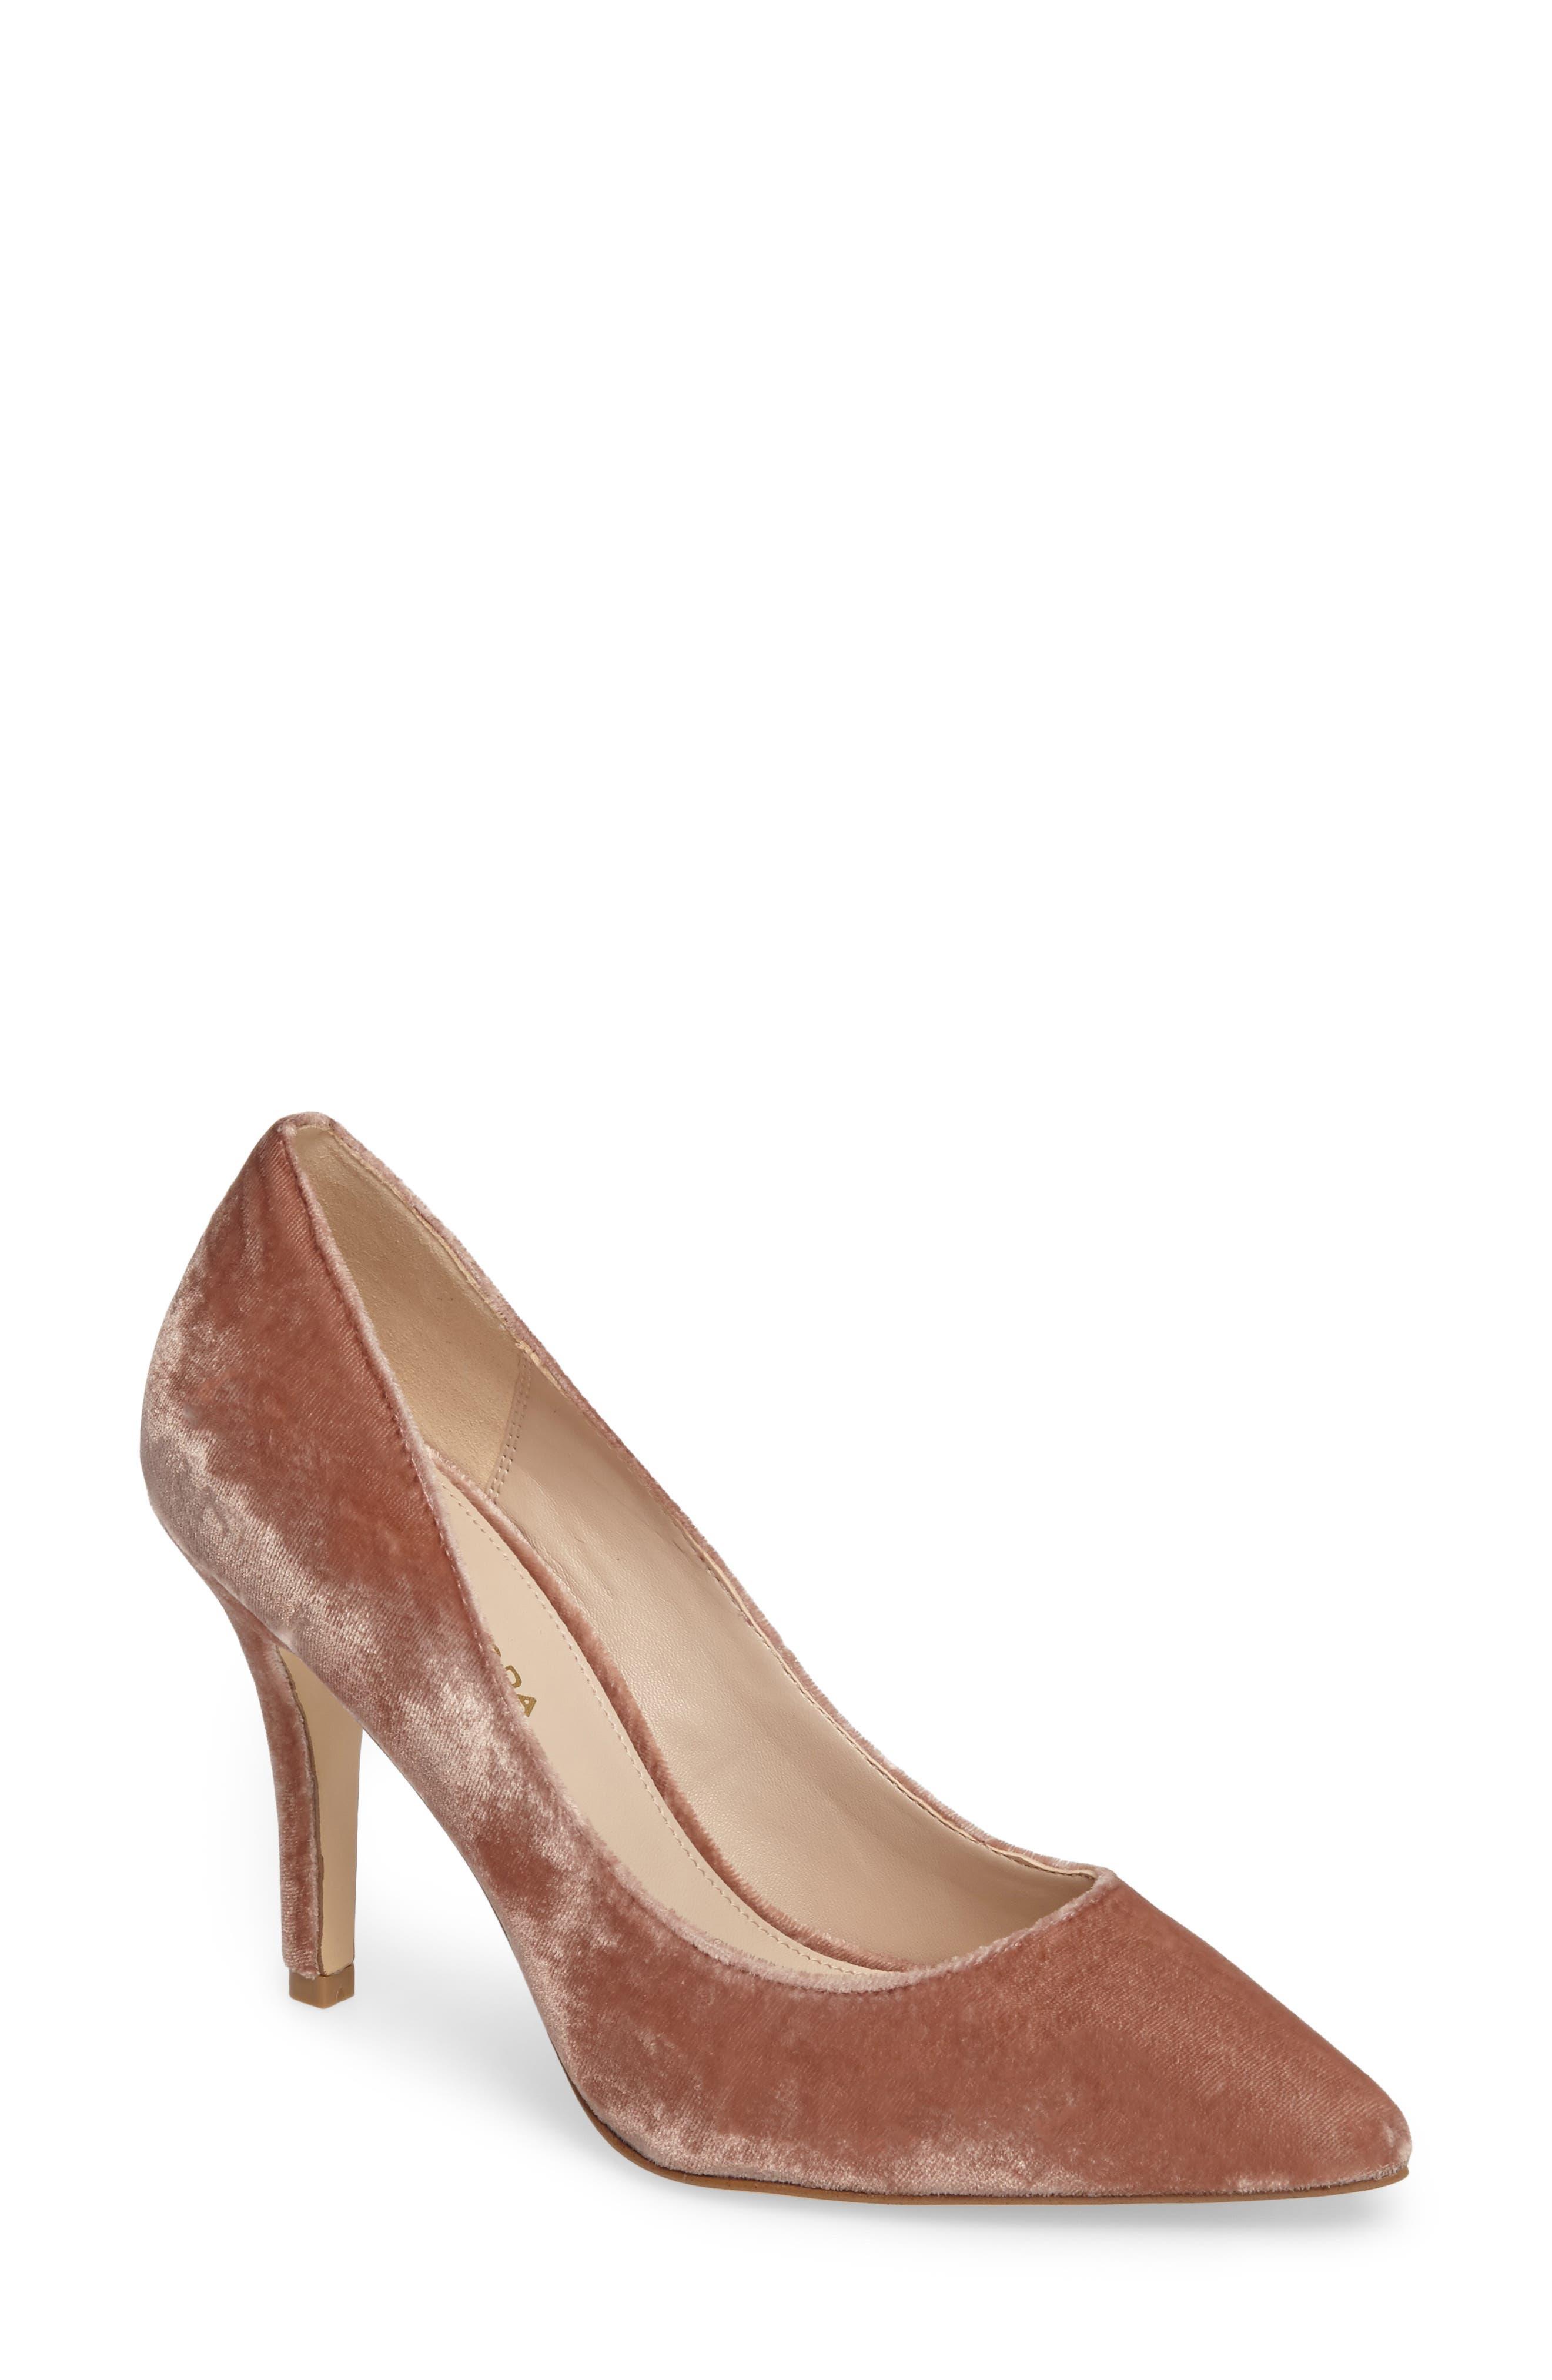 Pelle Moda Vally2 Pointy Toe Pump (Women)